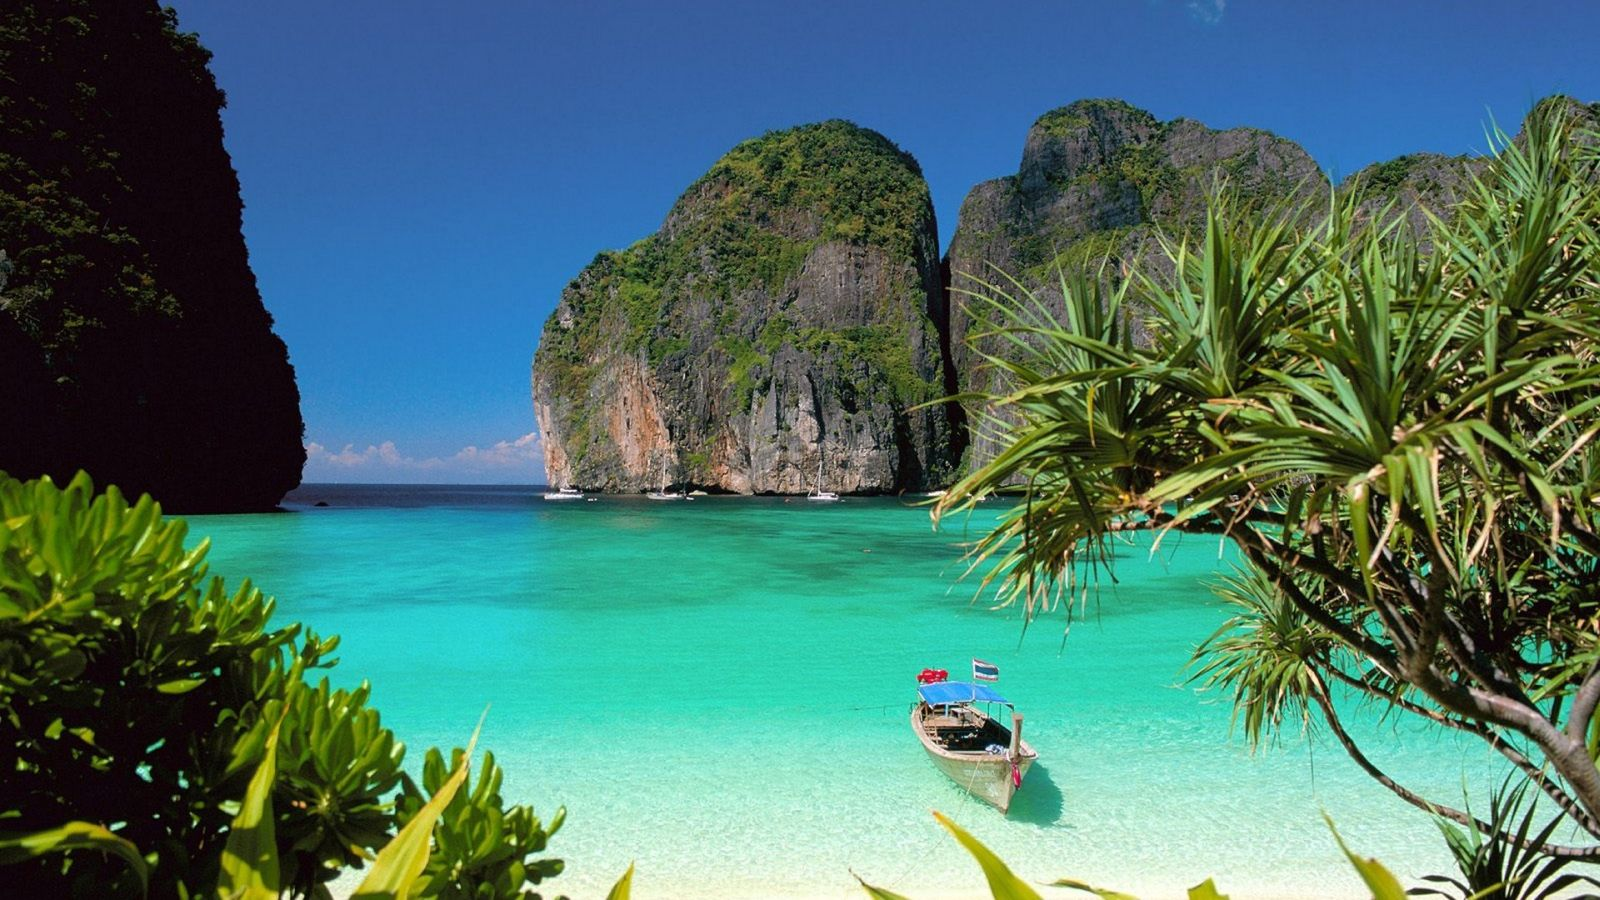 Beautiful Island wallpaper for desktop